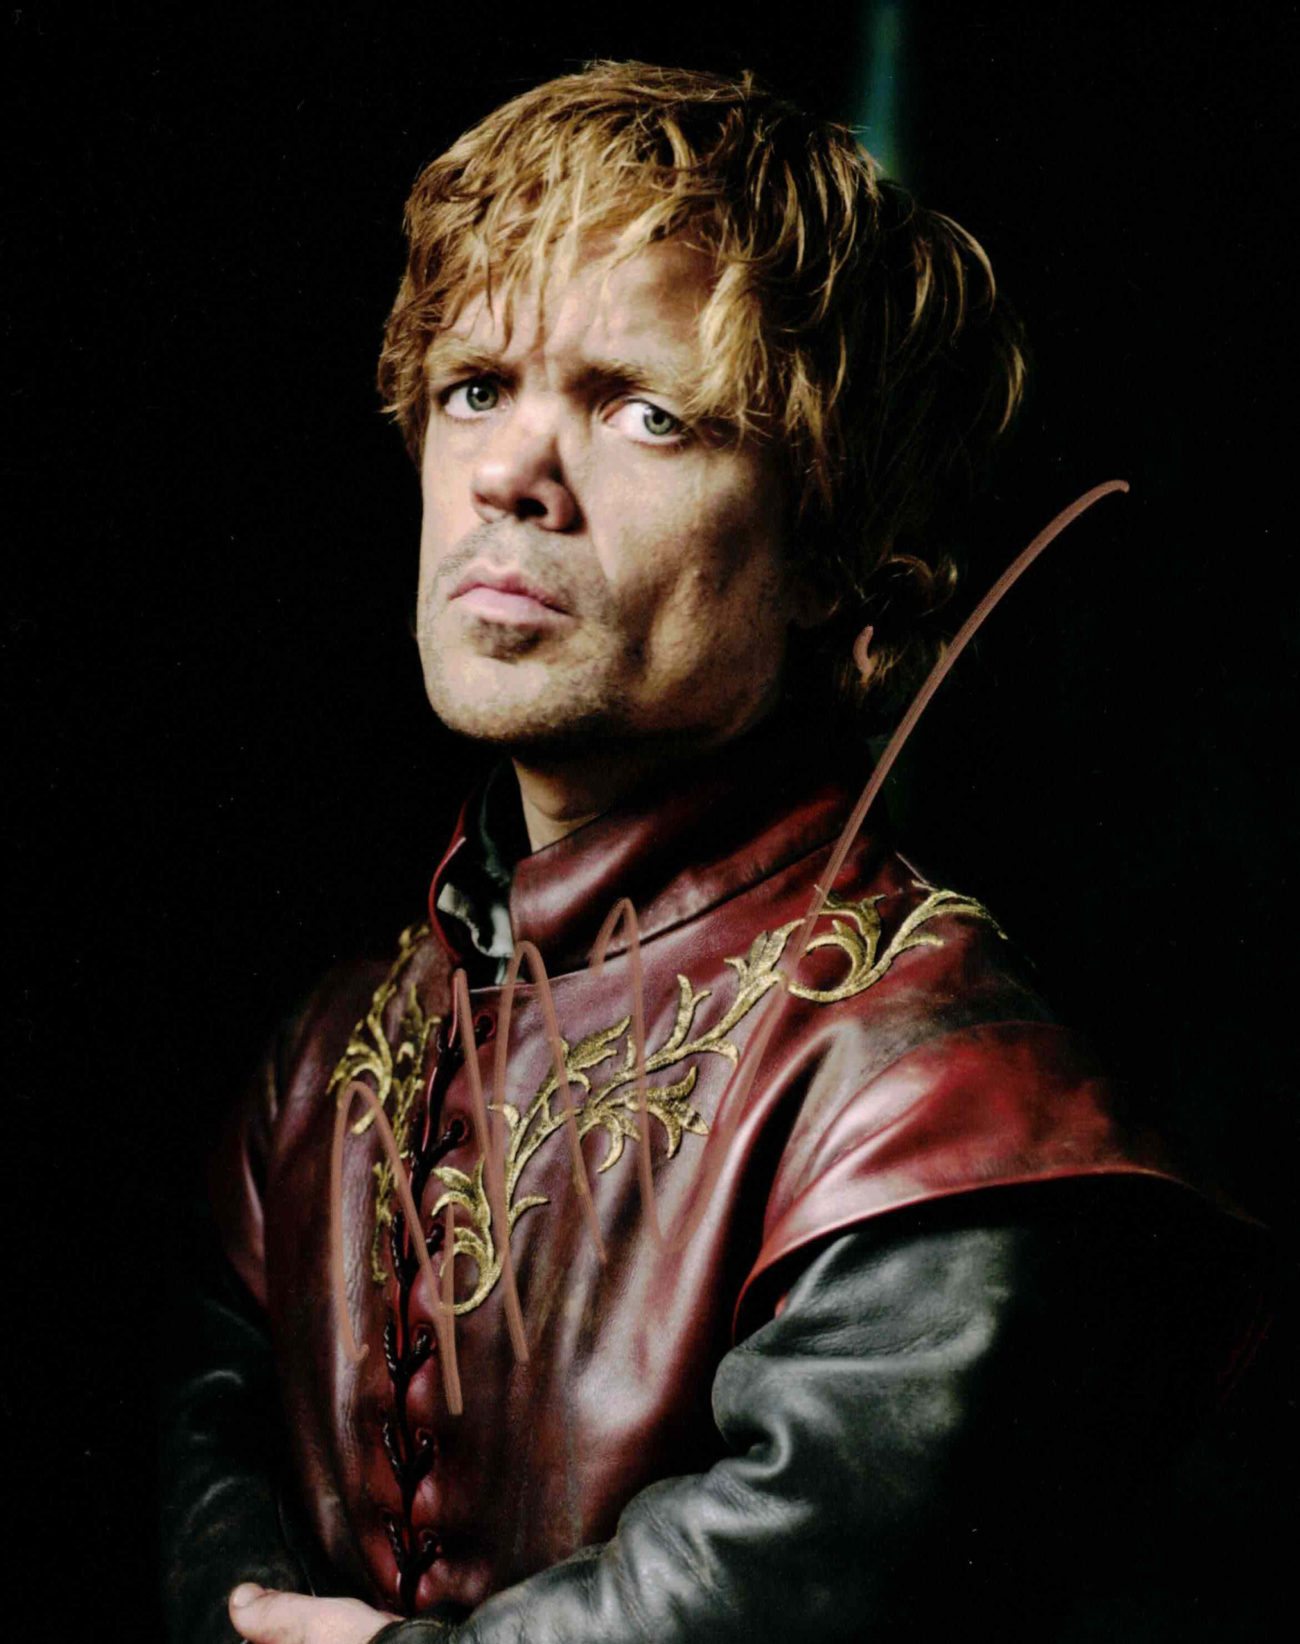 Peter Dinklage / Tyrion Lannister, Hra o trůny - autogram